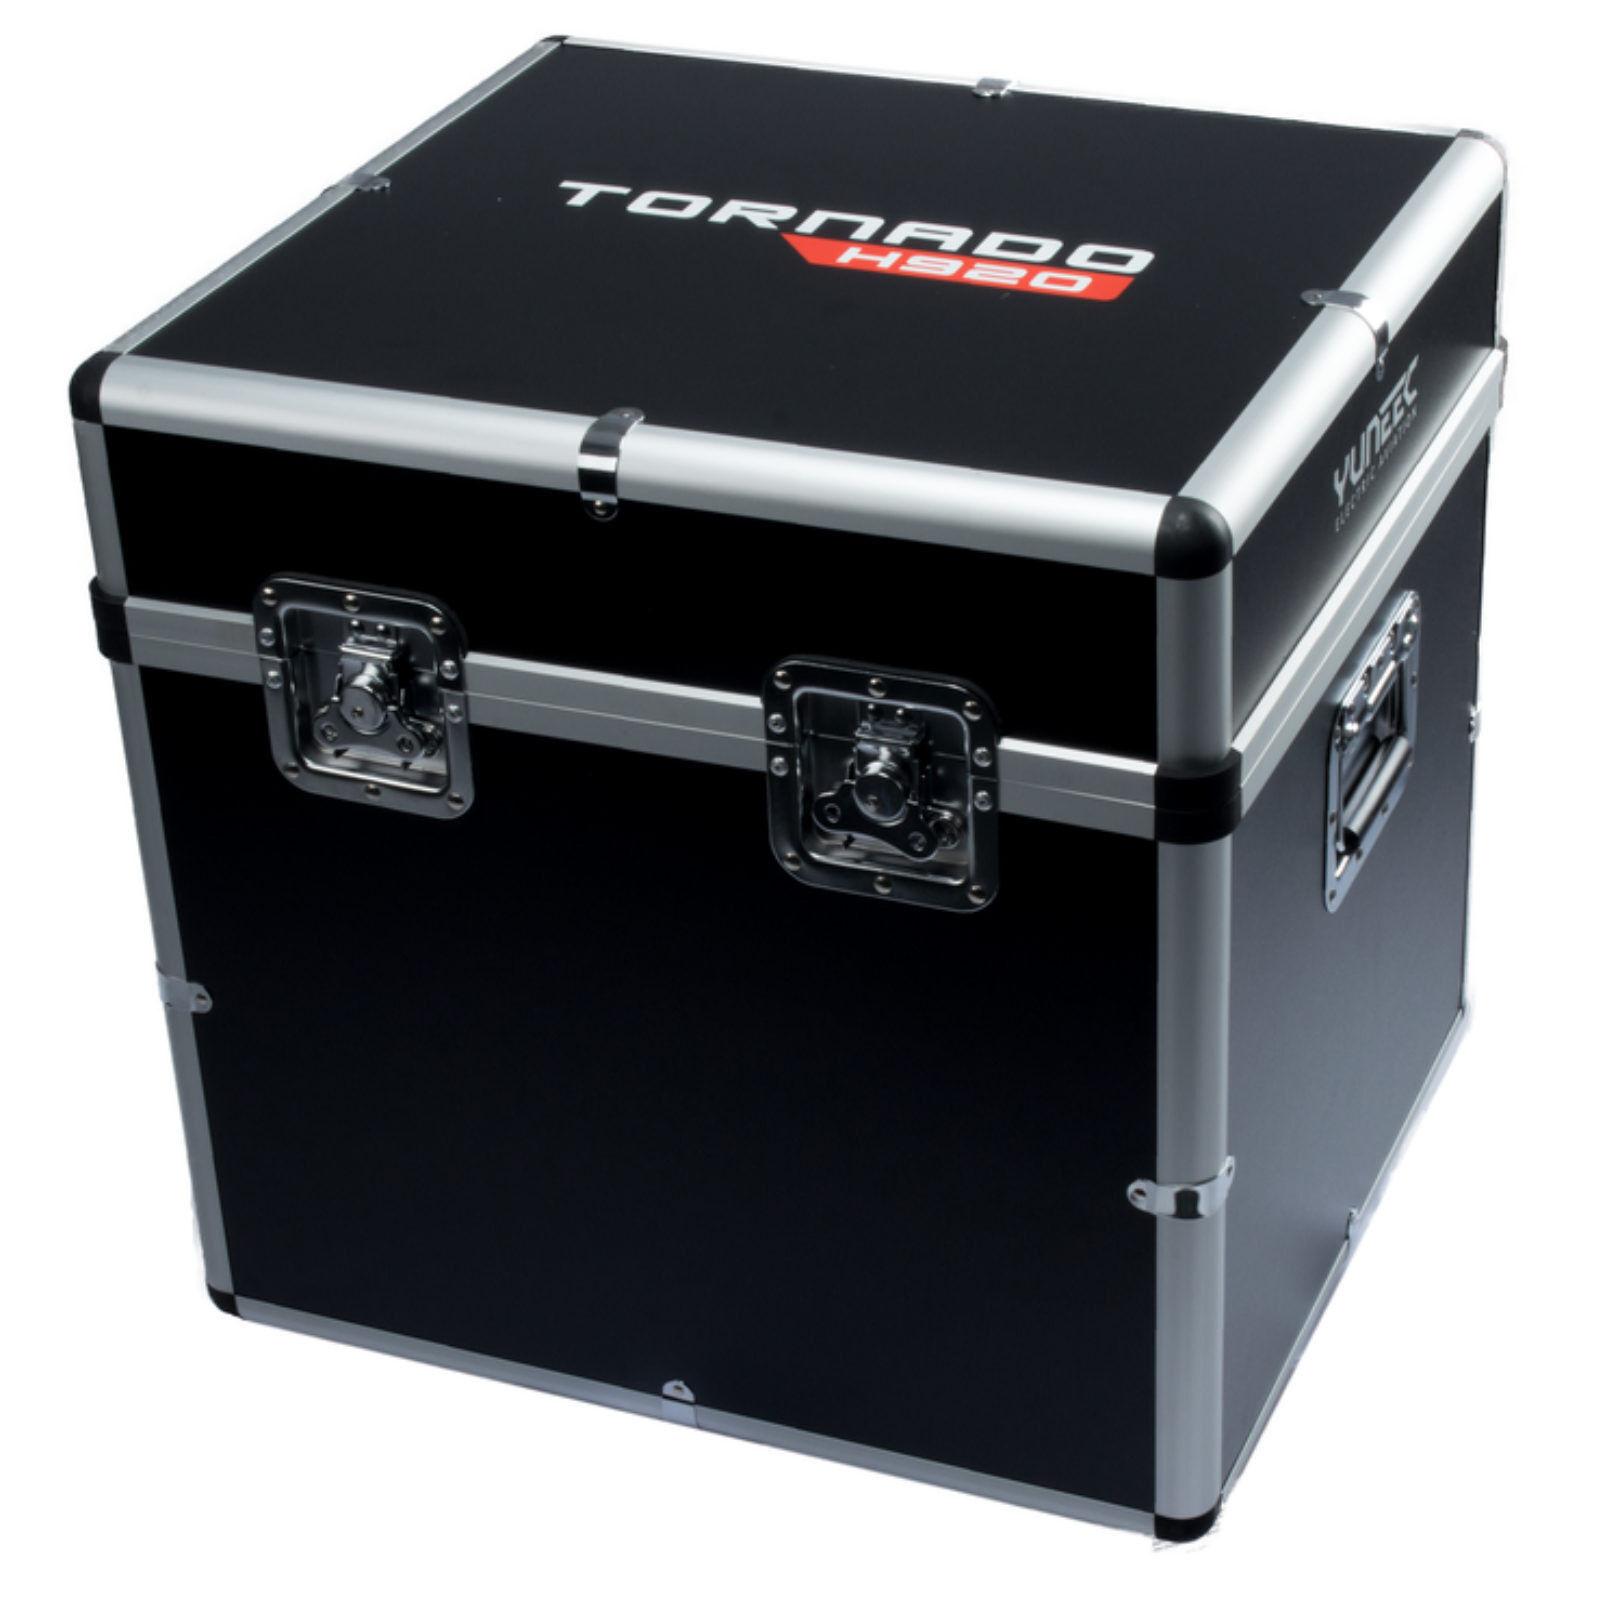 Maleta para yuneec tornado h920 h920 maleta de transporte universalmente uso individual